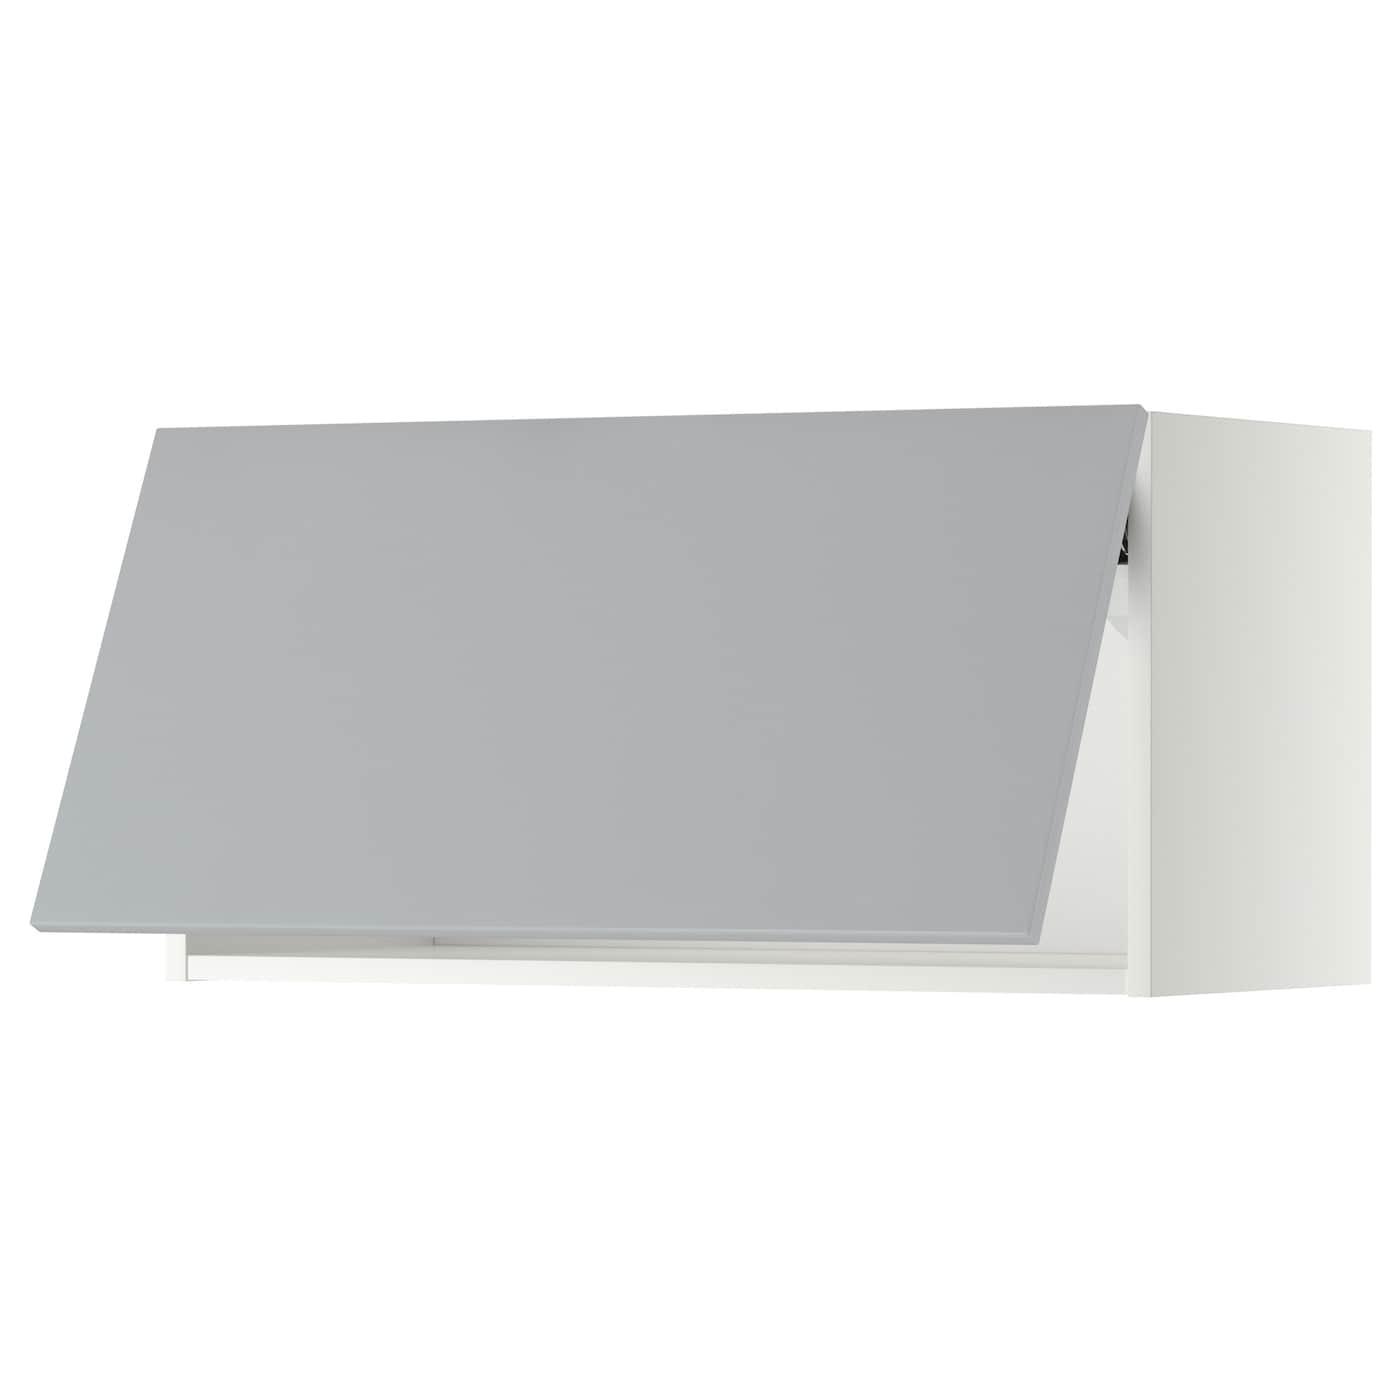 METOD, Wandschrank horizontal, weiß 999.179.88